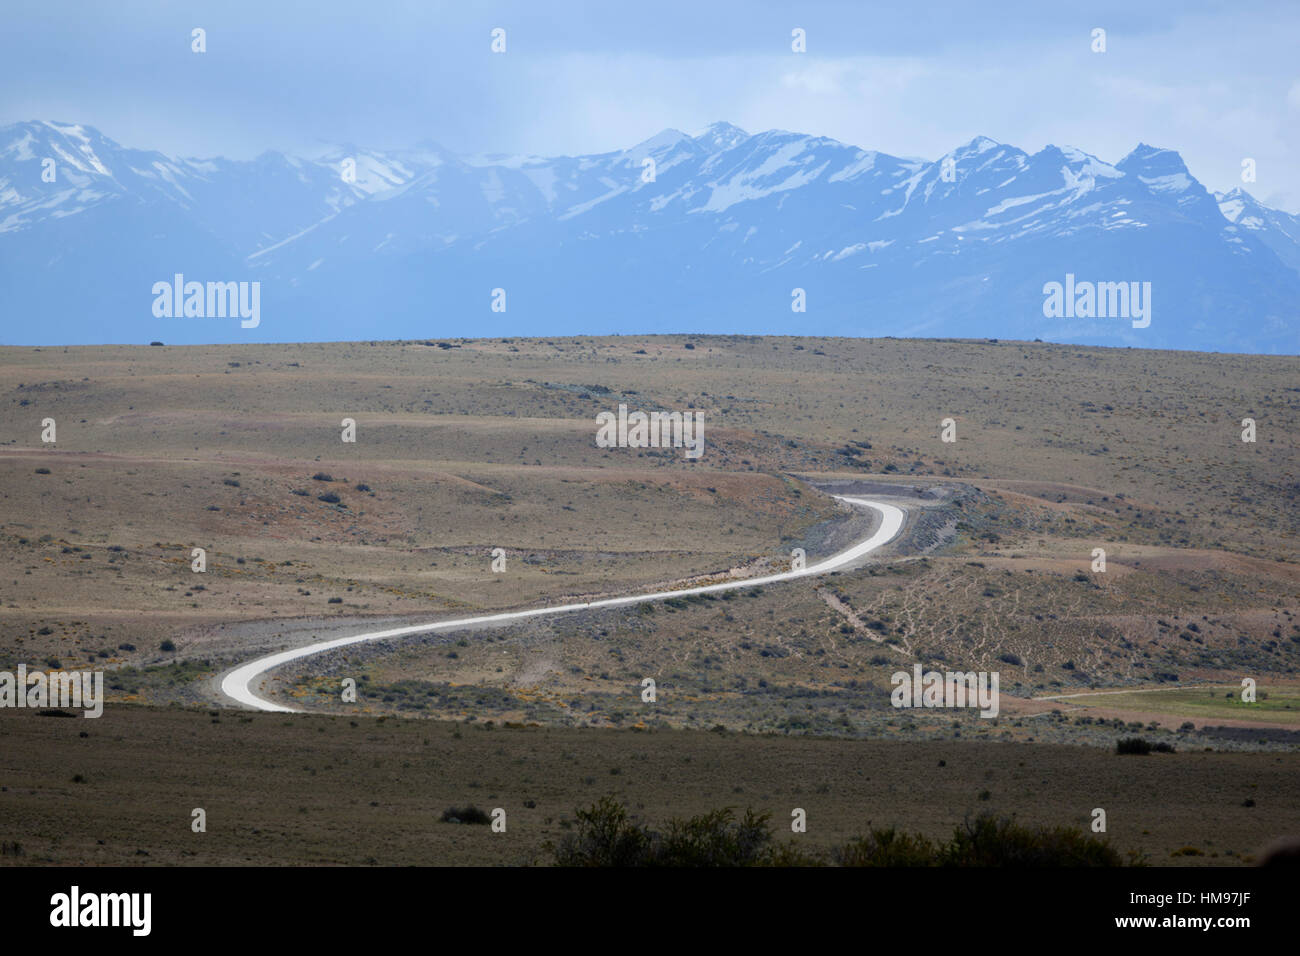 Winding desert road and Andes mountains, El Calafate, Parque Nacional Los Glaciares, Patagonia, Argentina, South - Stock Image